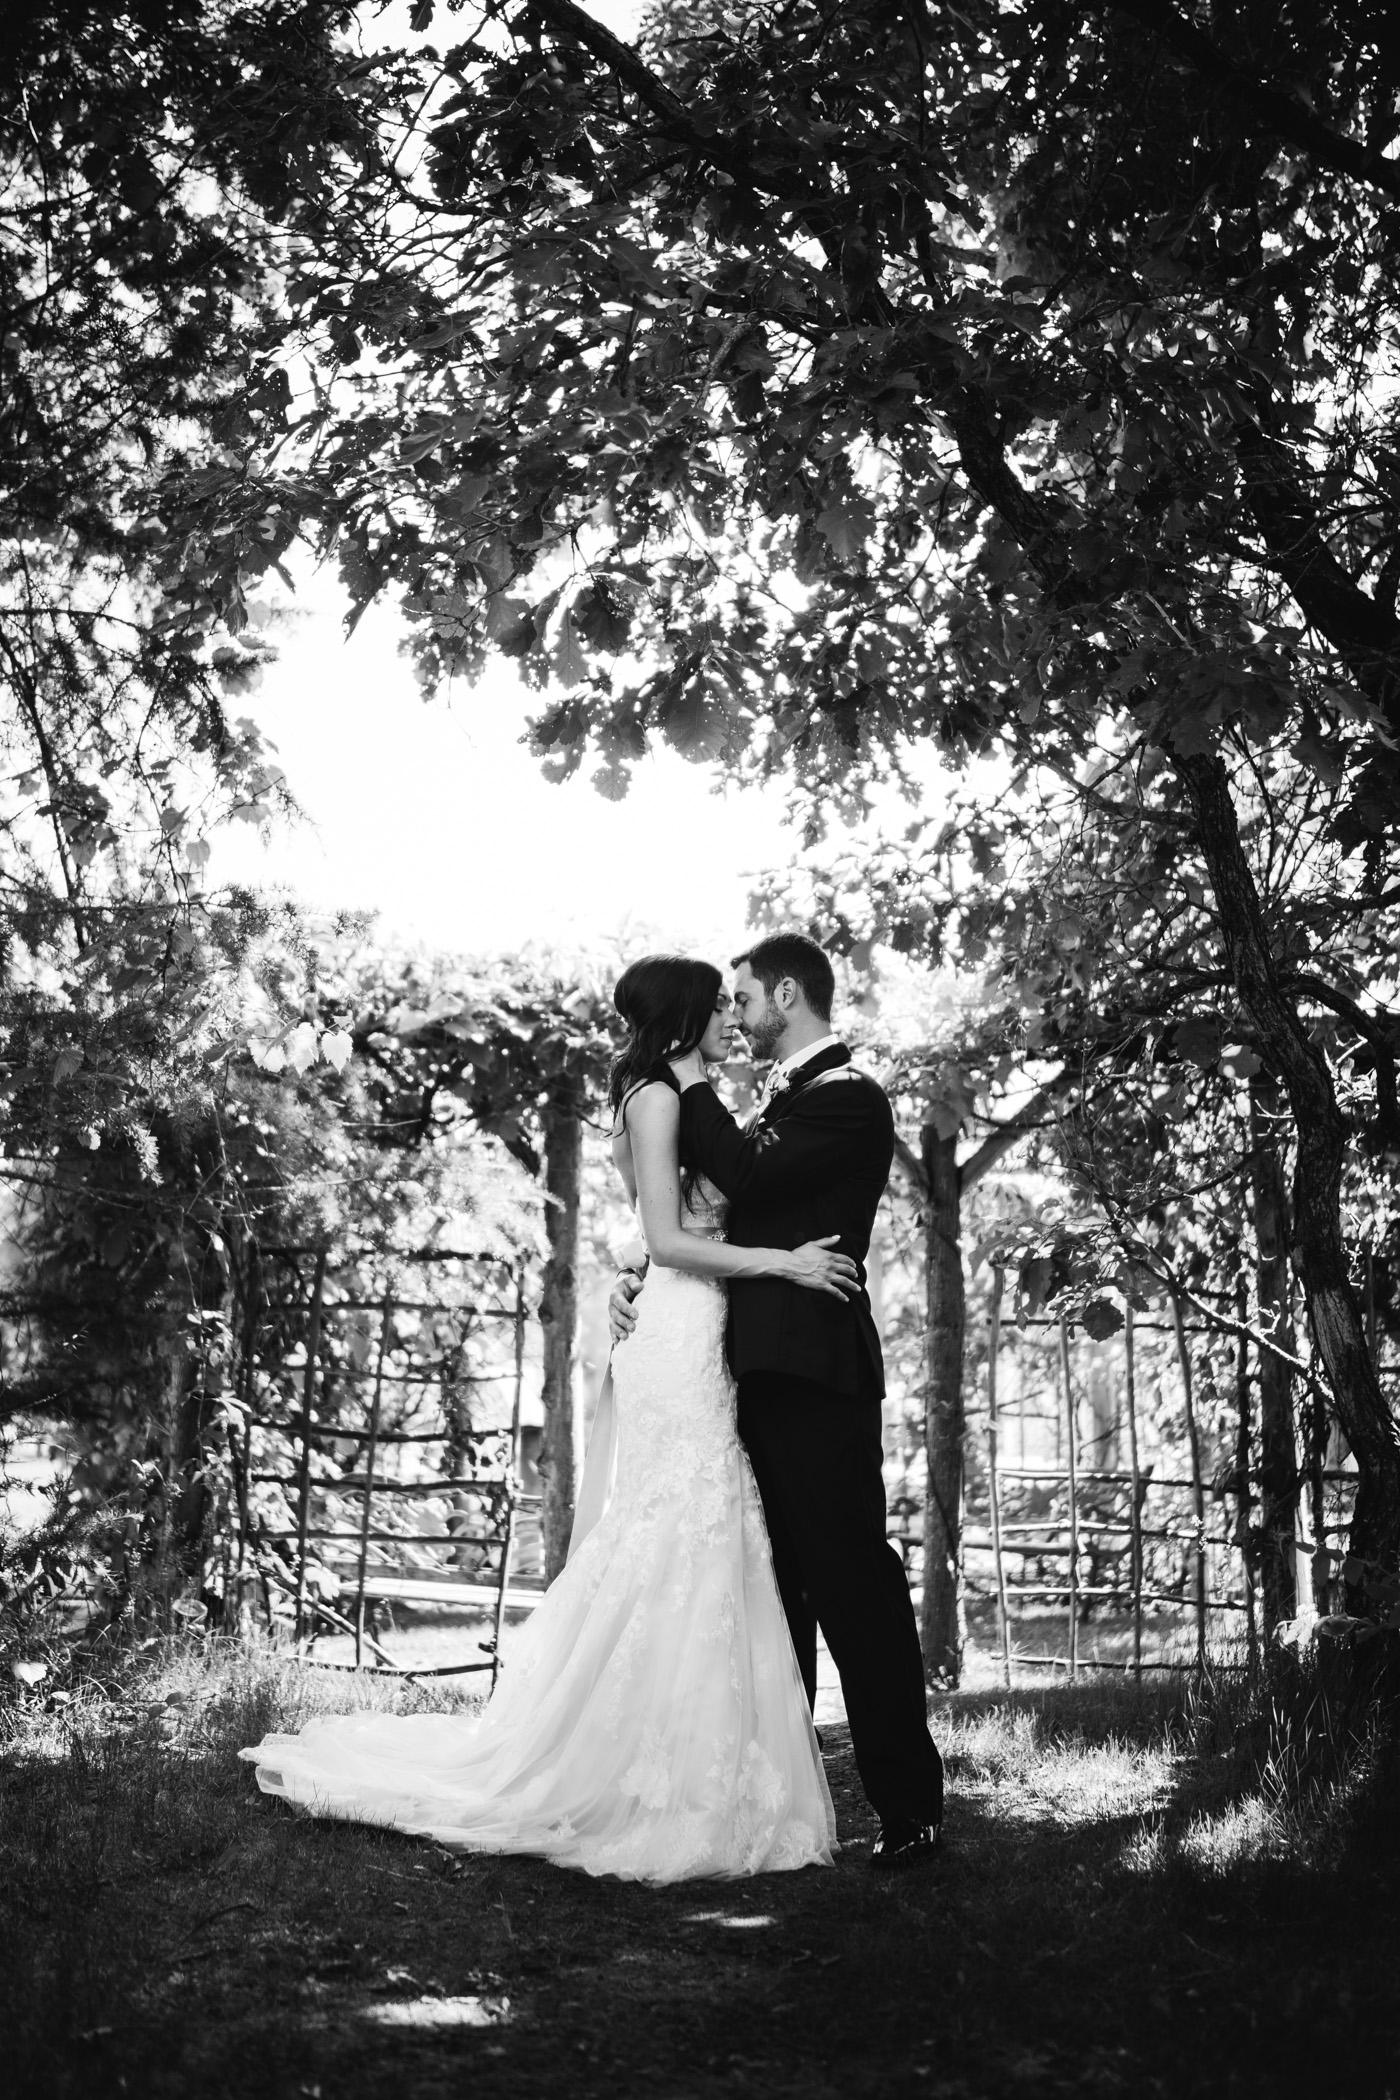 Hillary and Mark - Pineridge Hollow Wedding - Cojo Photo-1367.jpg